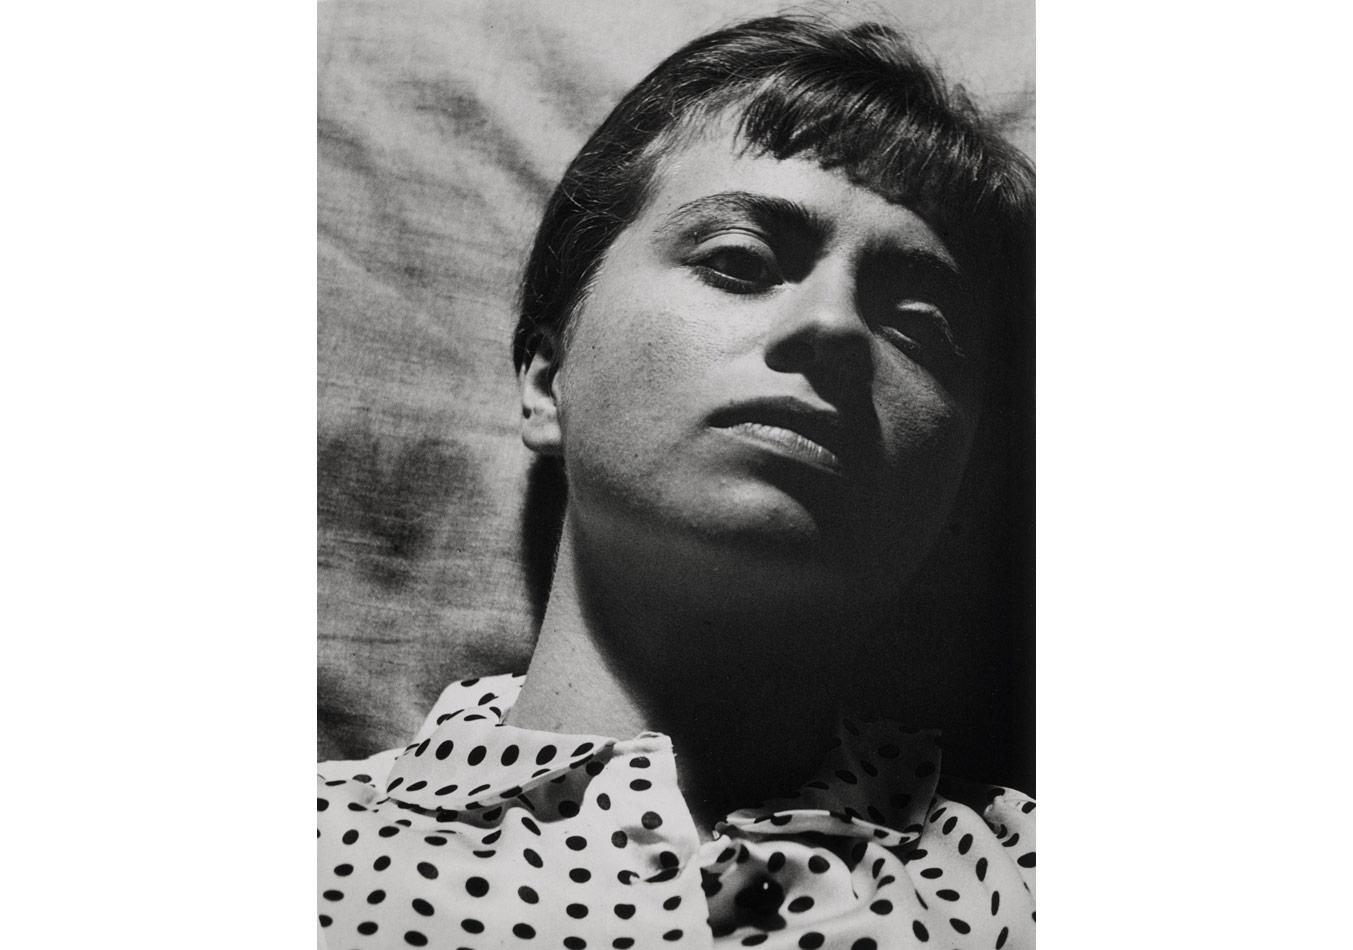 Elfriede Stegemeyer (1908-1988), Öz portre, 1933 © Dijital görüntü: Museum Associates/LACMA/Art Resource NY / Scala, Floransa